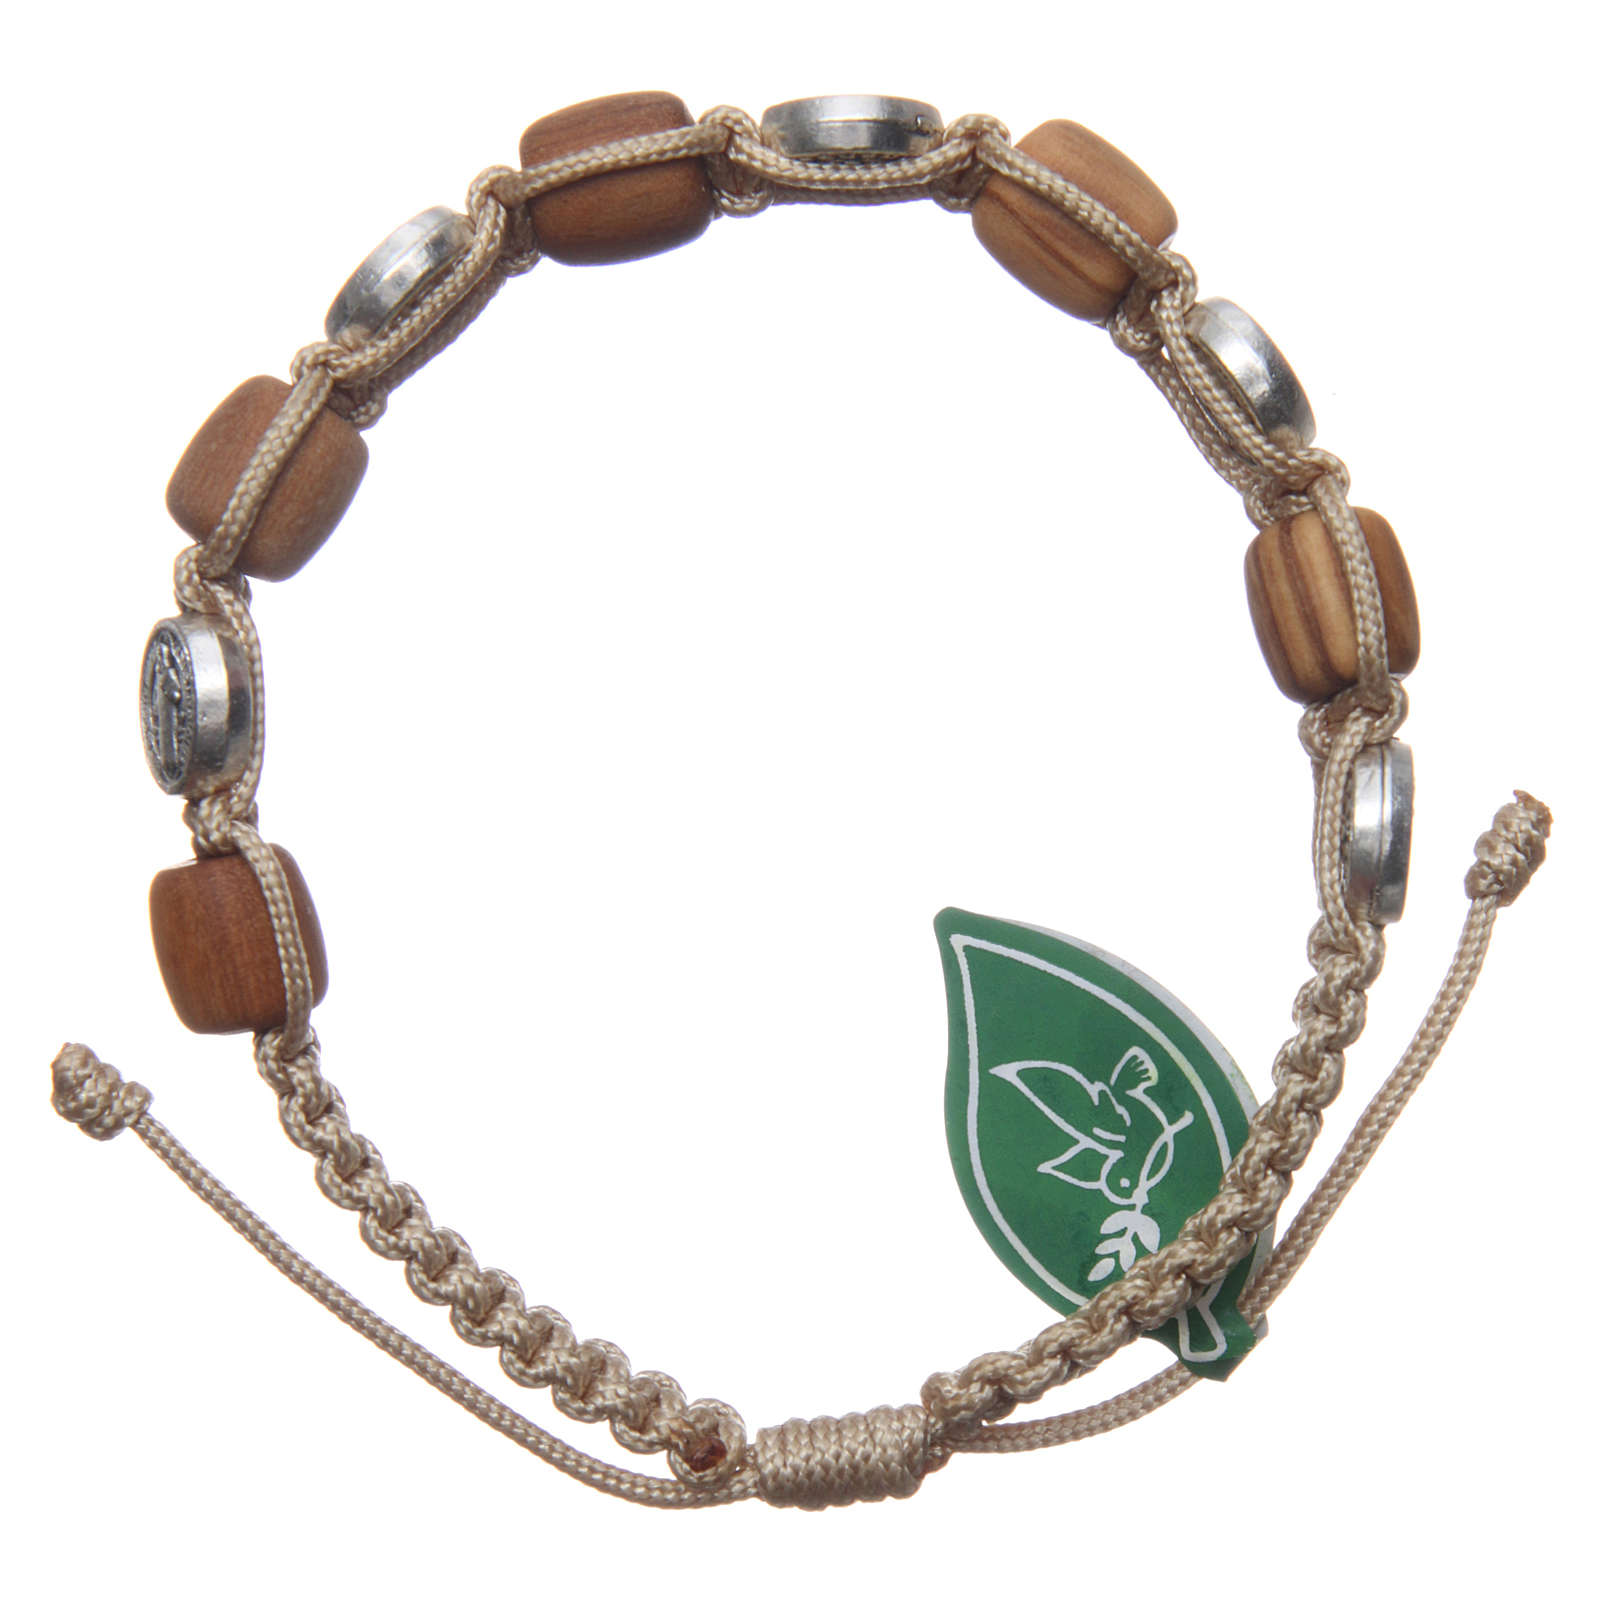 Pulsera madera olivo cruz San Benito cuerda beis 4